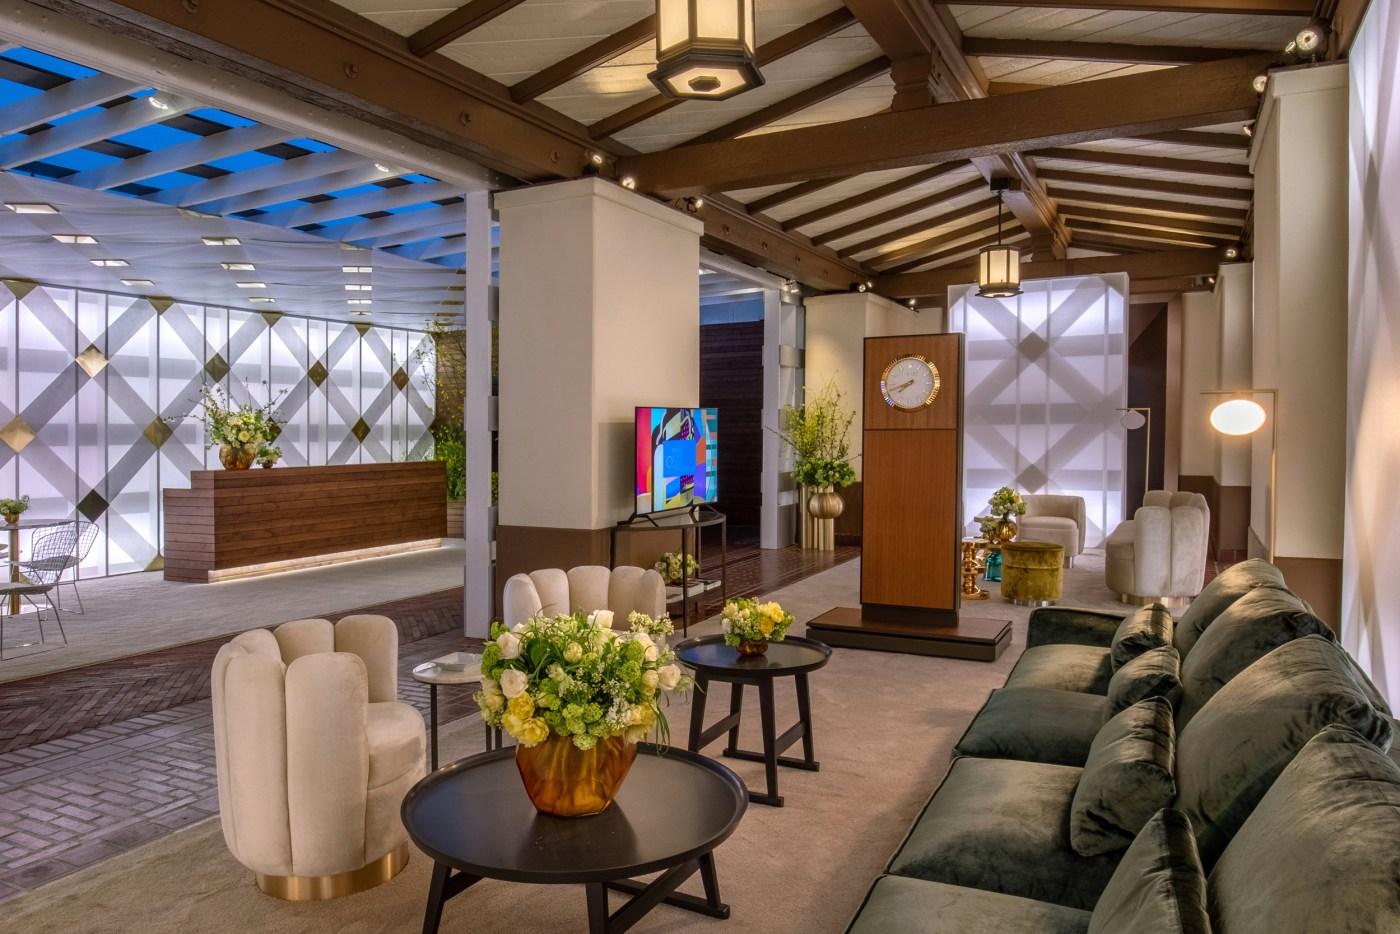 2021 Oscars Greenroom designed by Rolex